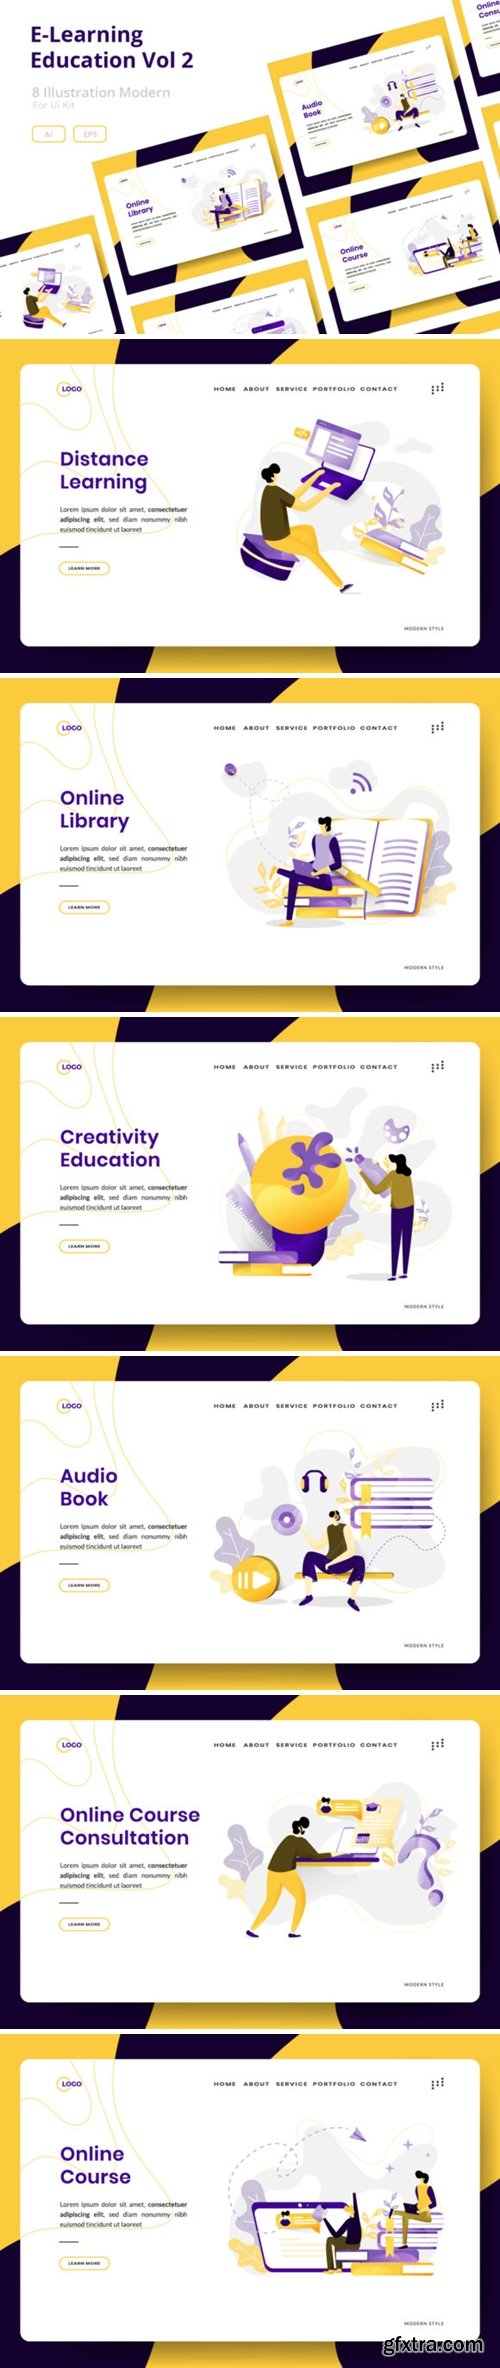 E-Learning Education Vol 2 3732985